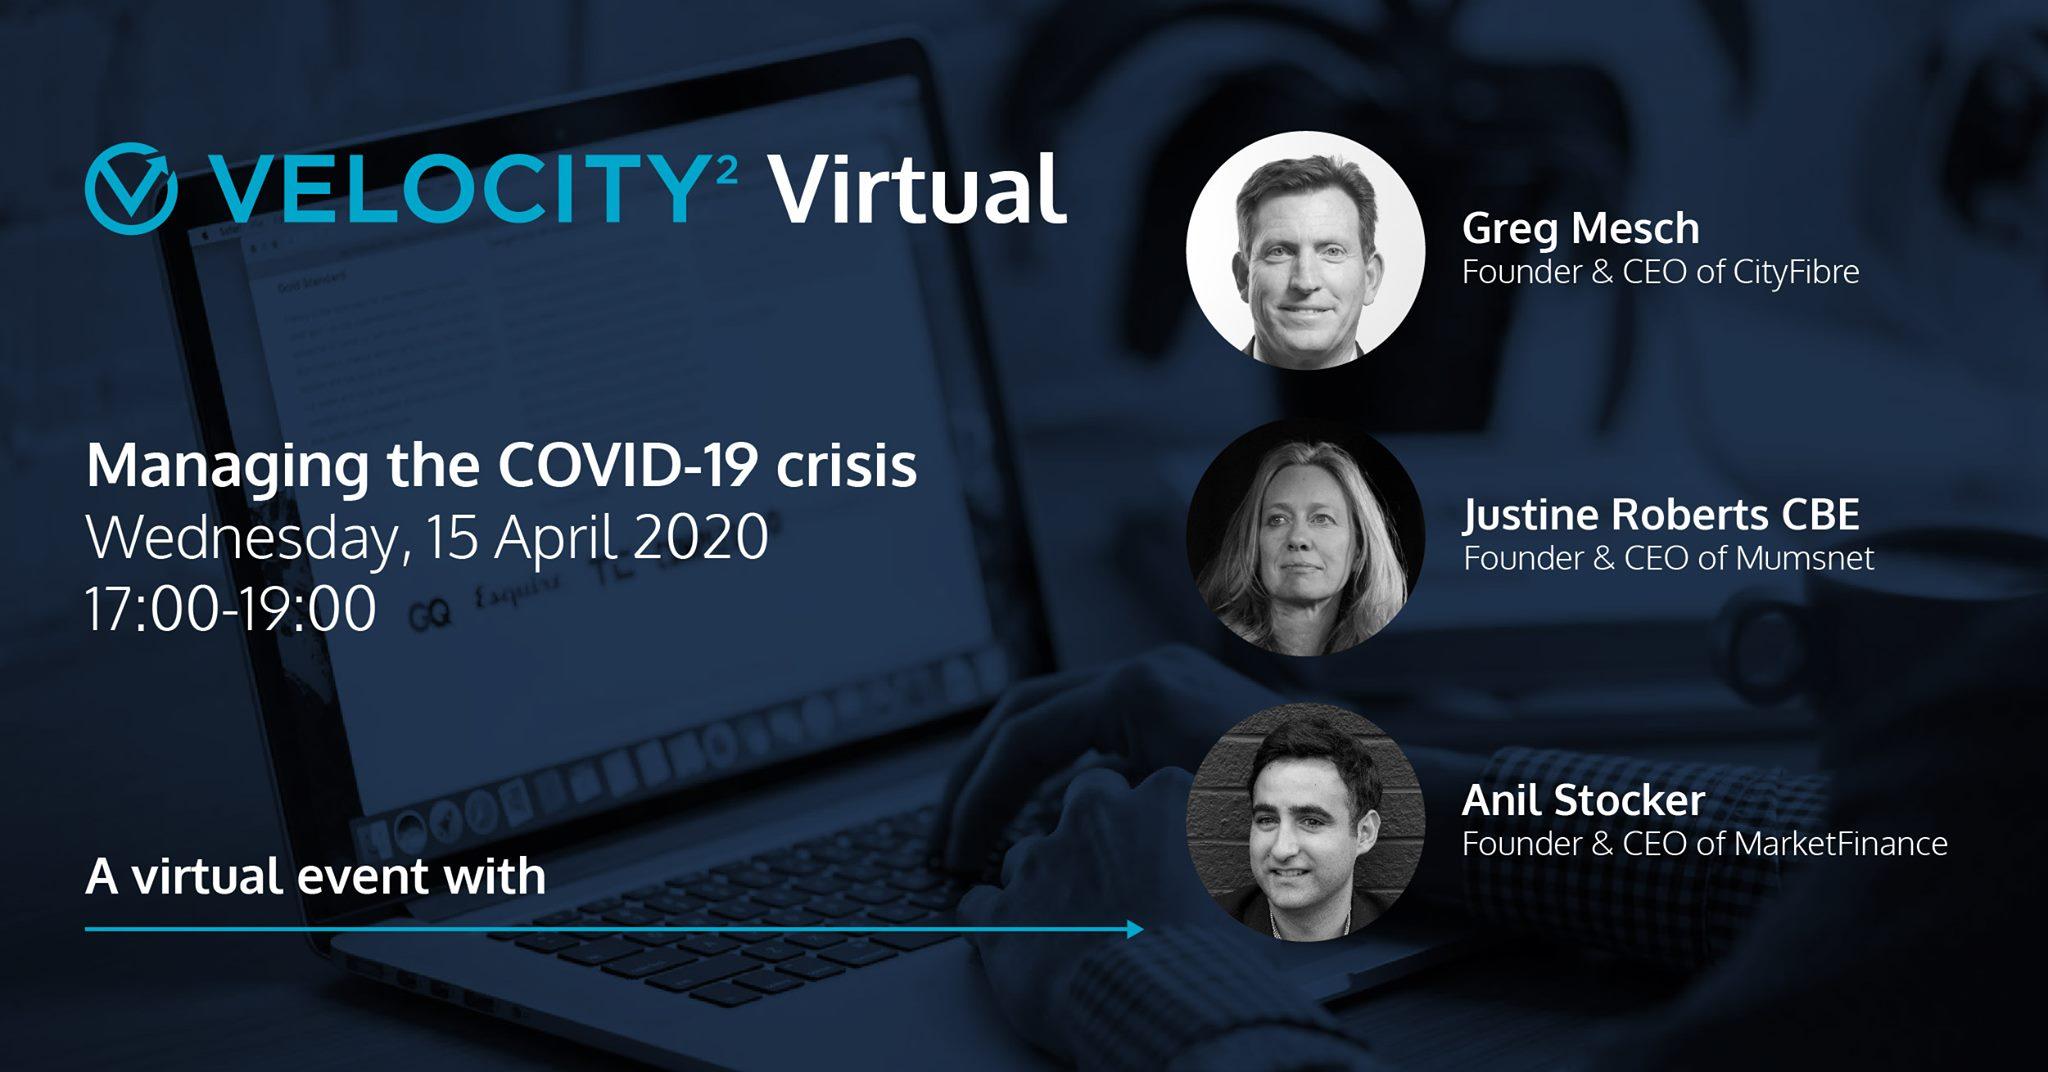 Velocity² Virtual